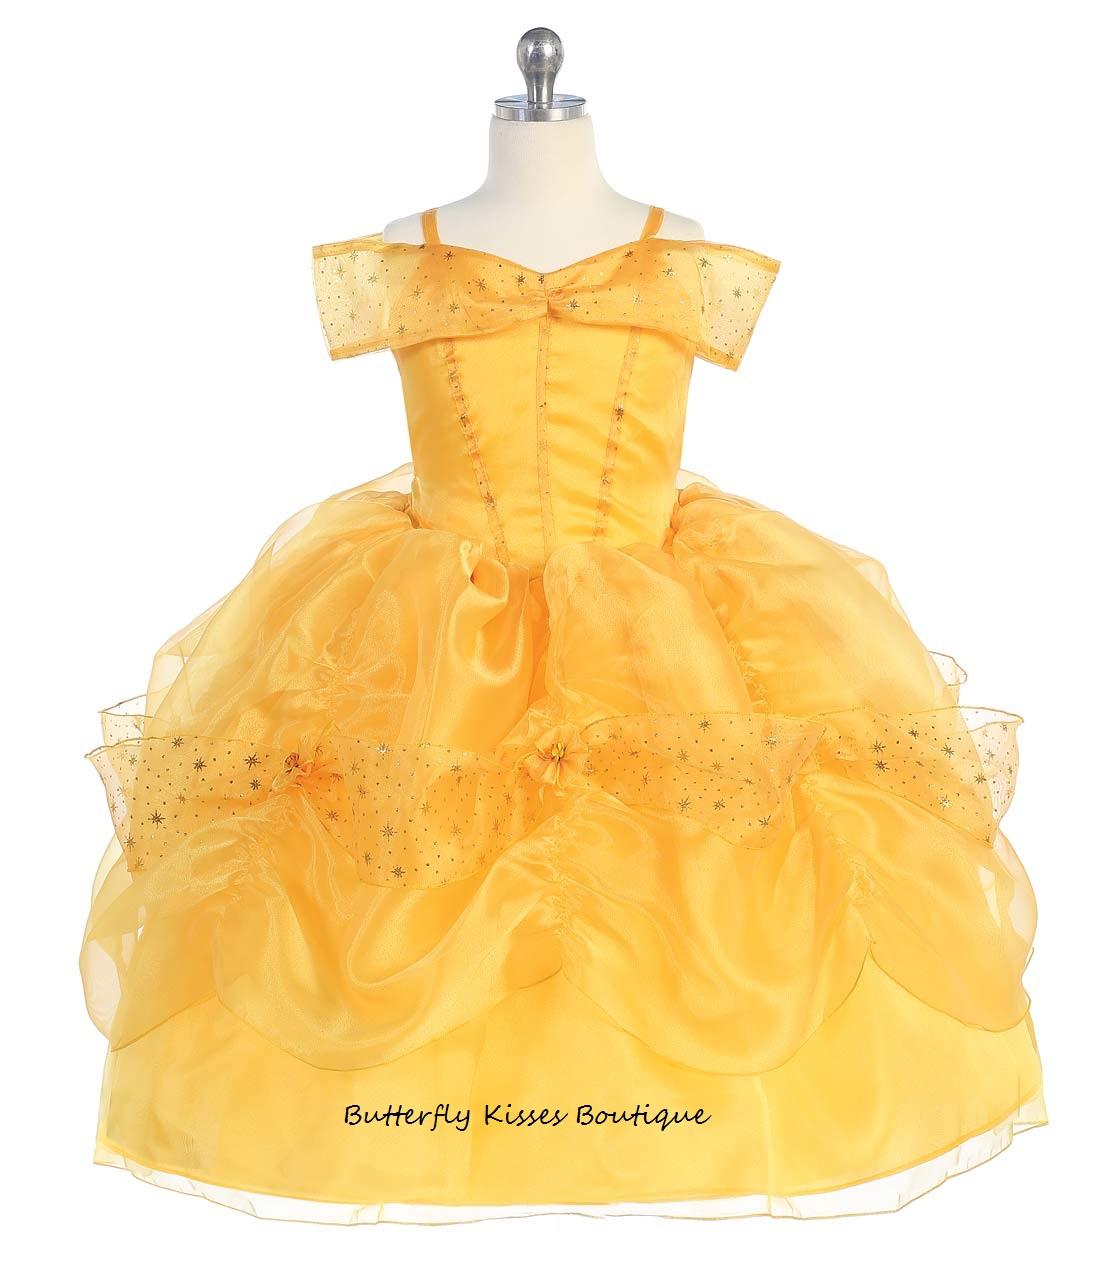 Belle Princess Toddler Girls Costume · Butterfly Kisses